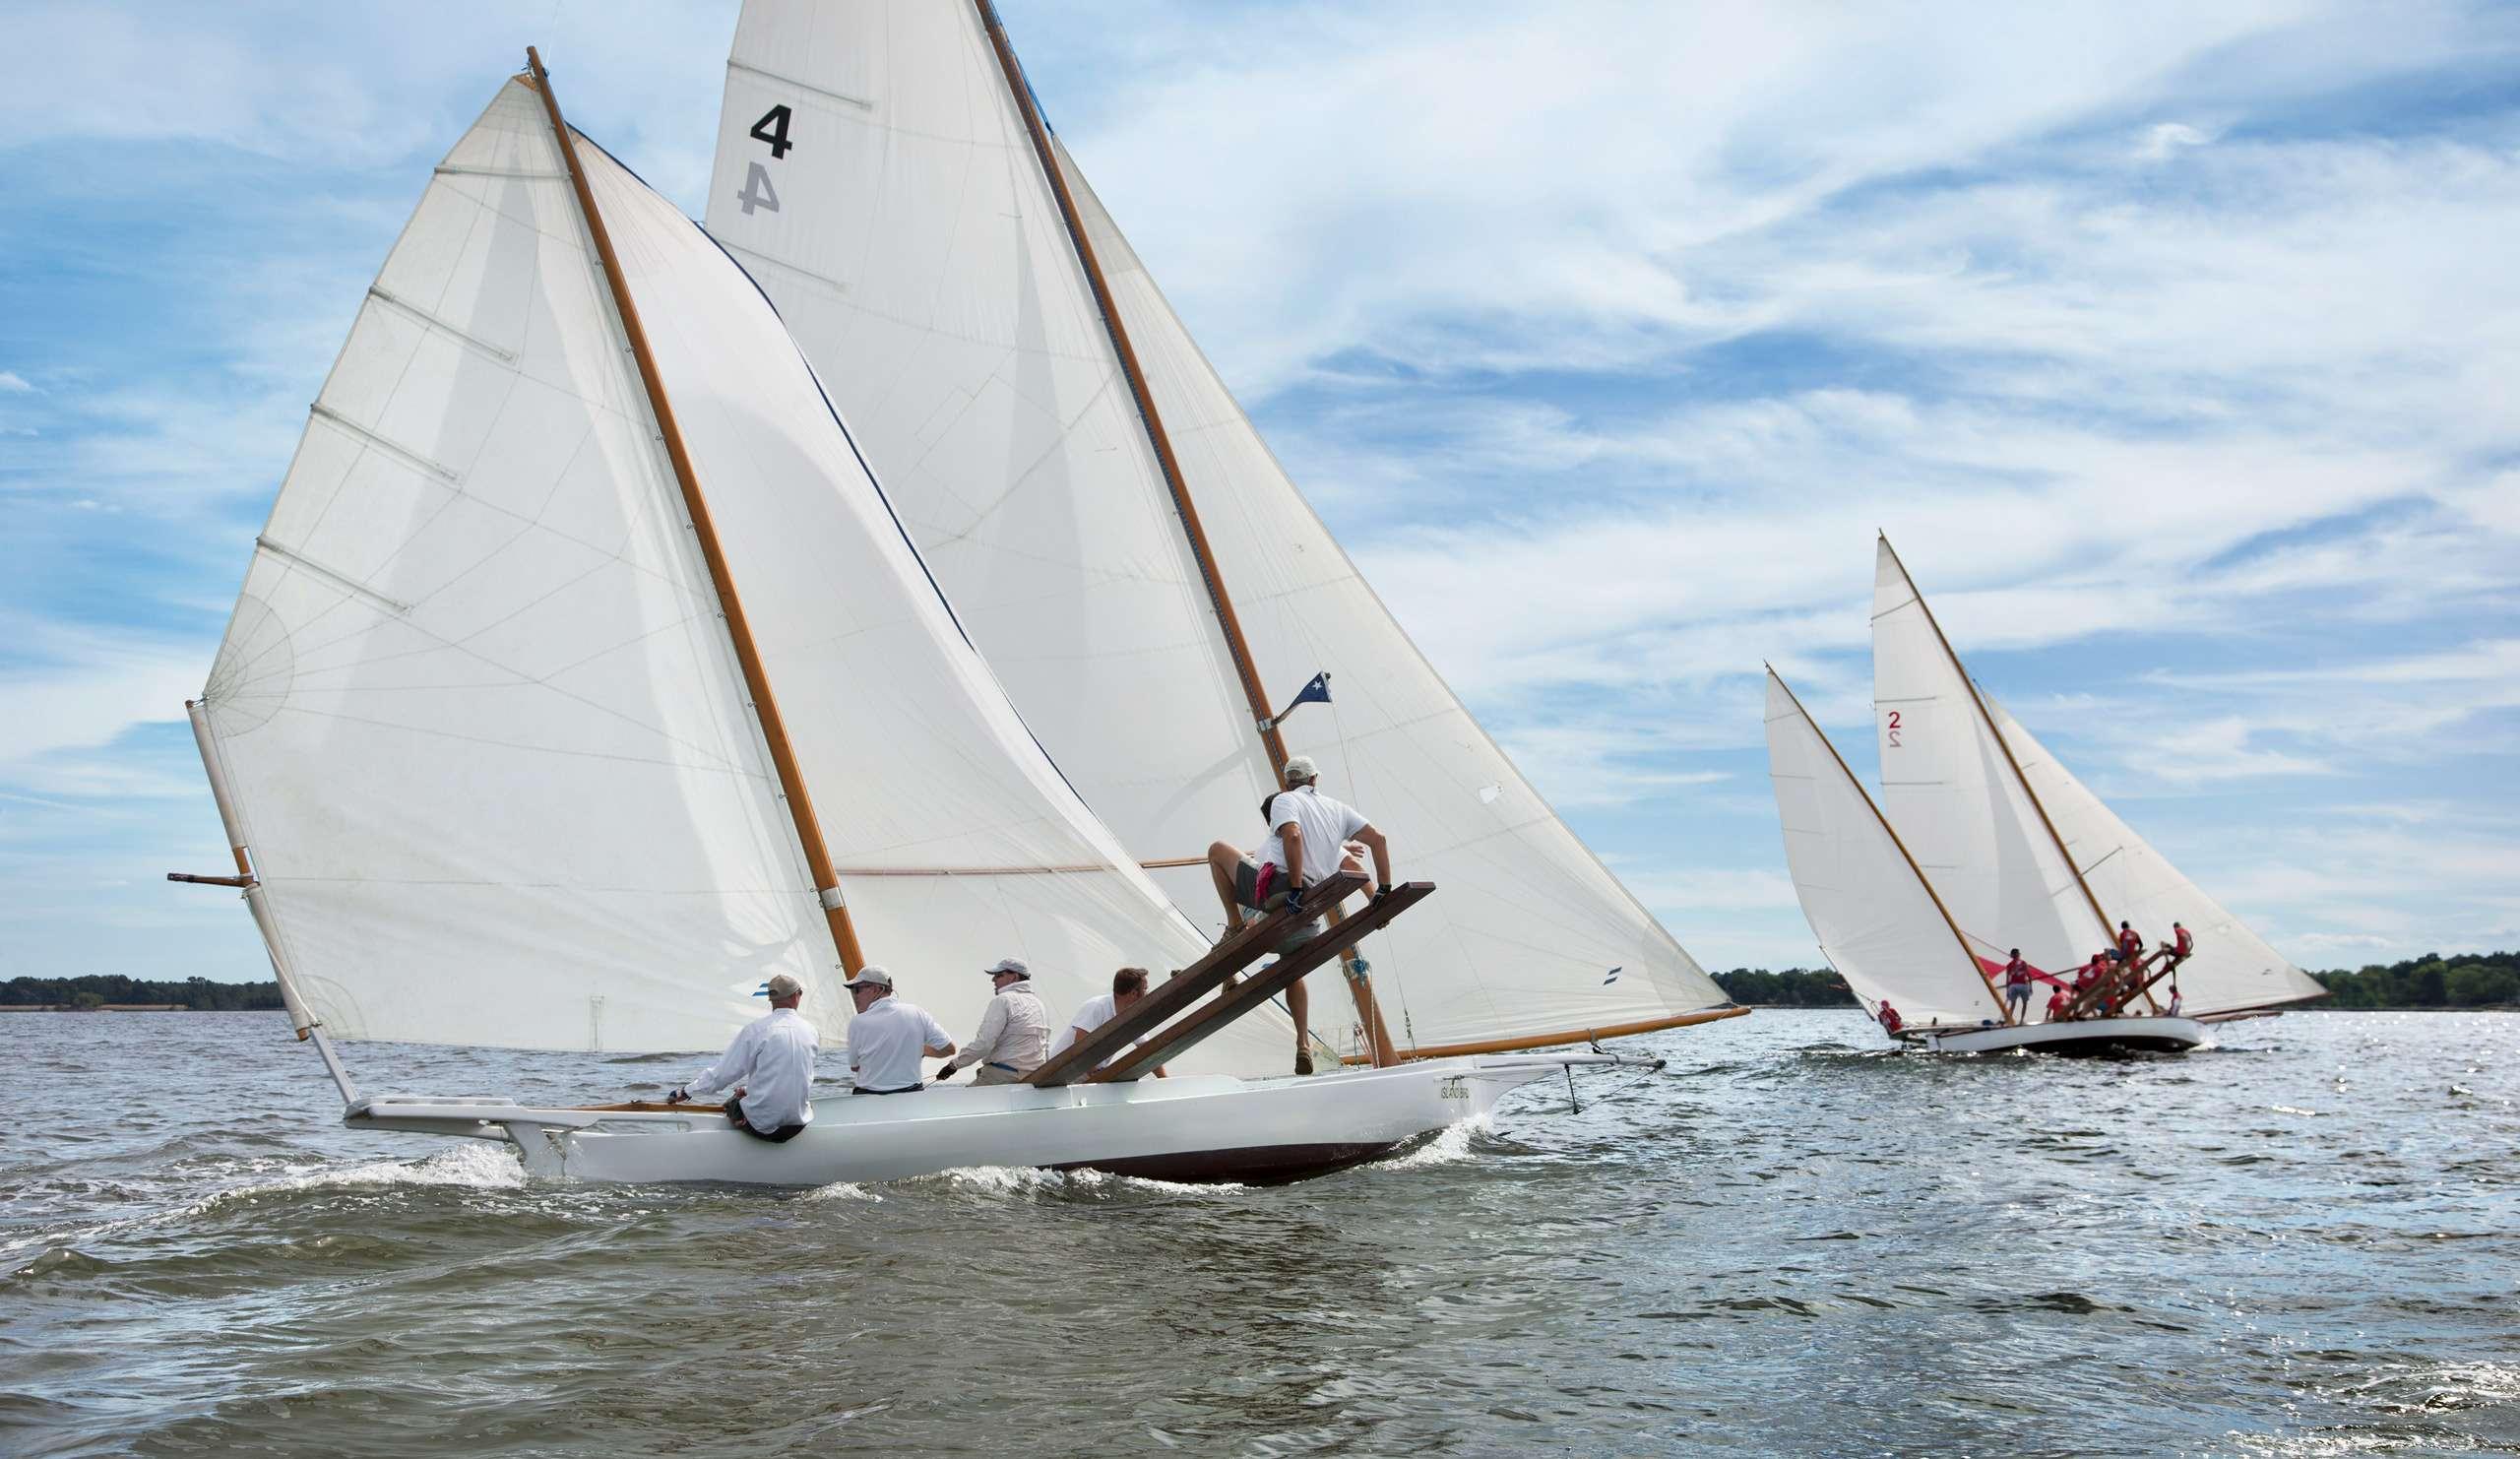 PORTFOLIO - Sailing - Log Canoes #28   PCG573